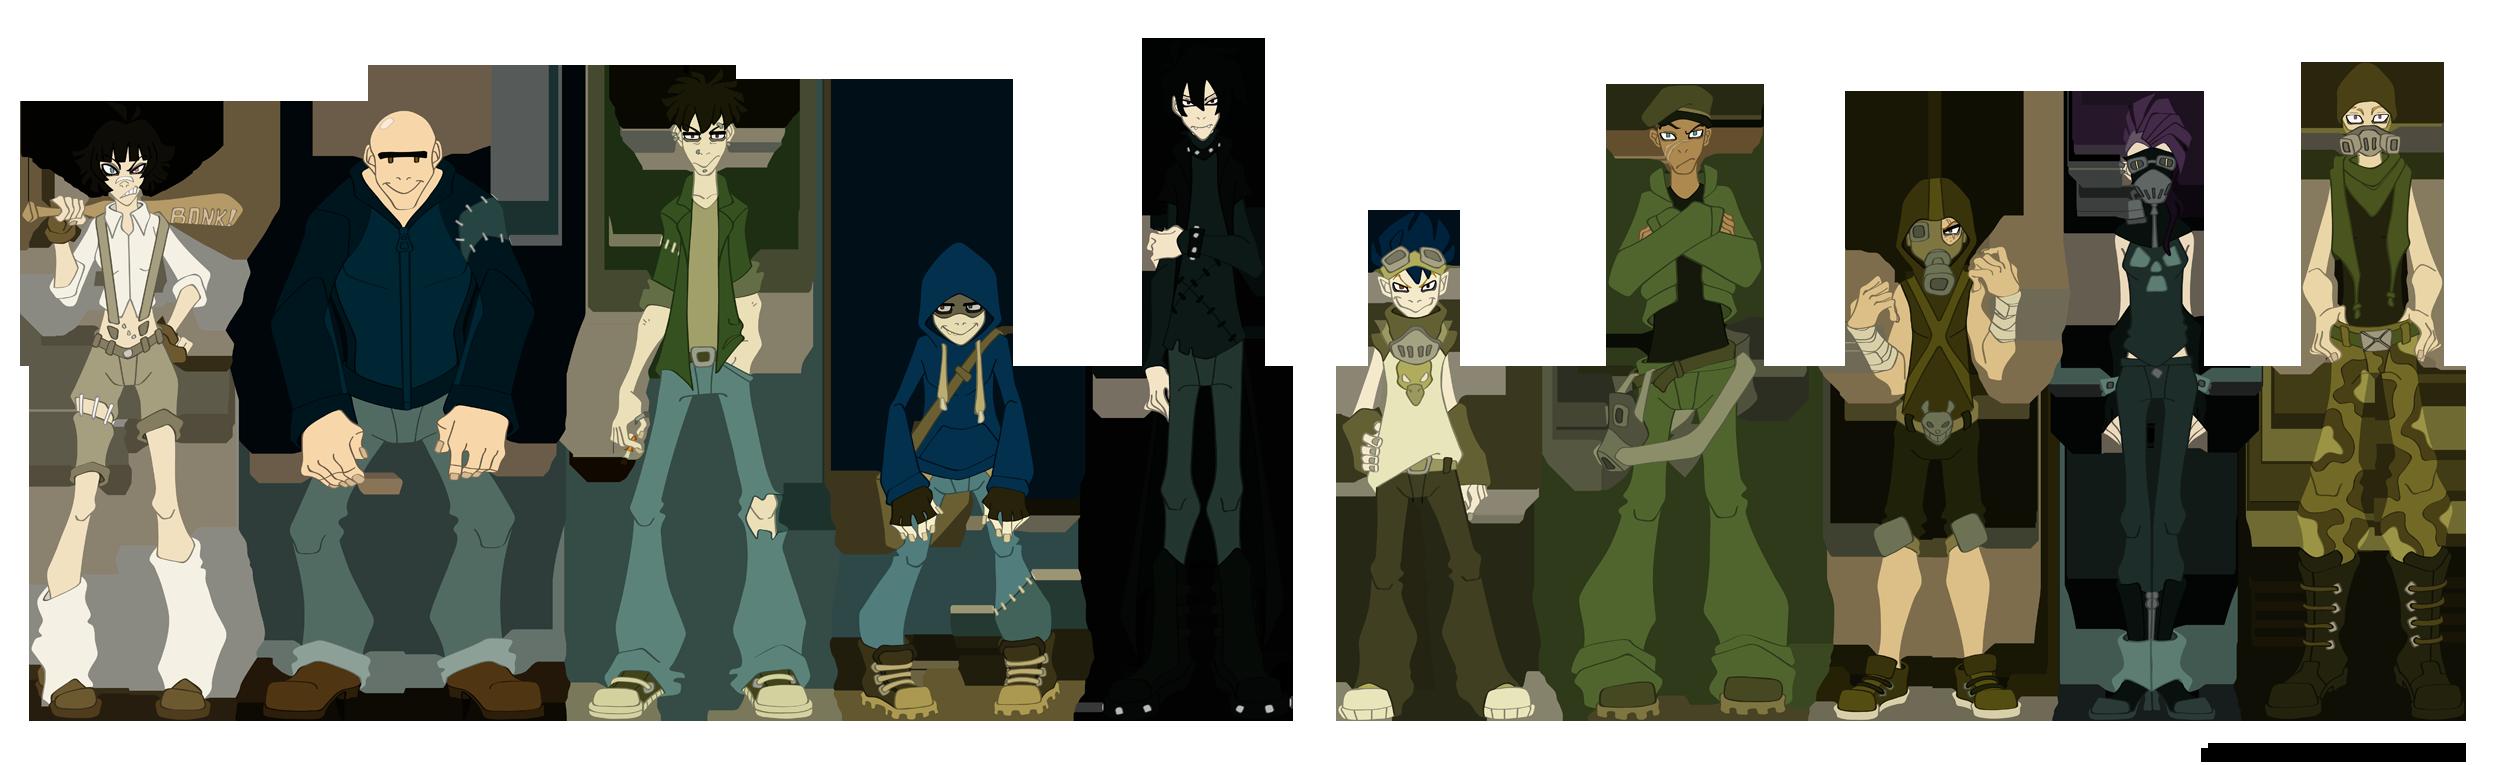 Underdog - characters by Icarus-Skollsun